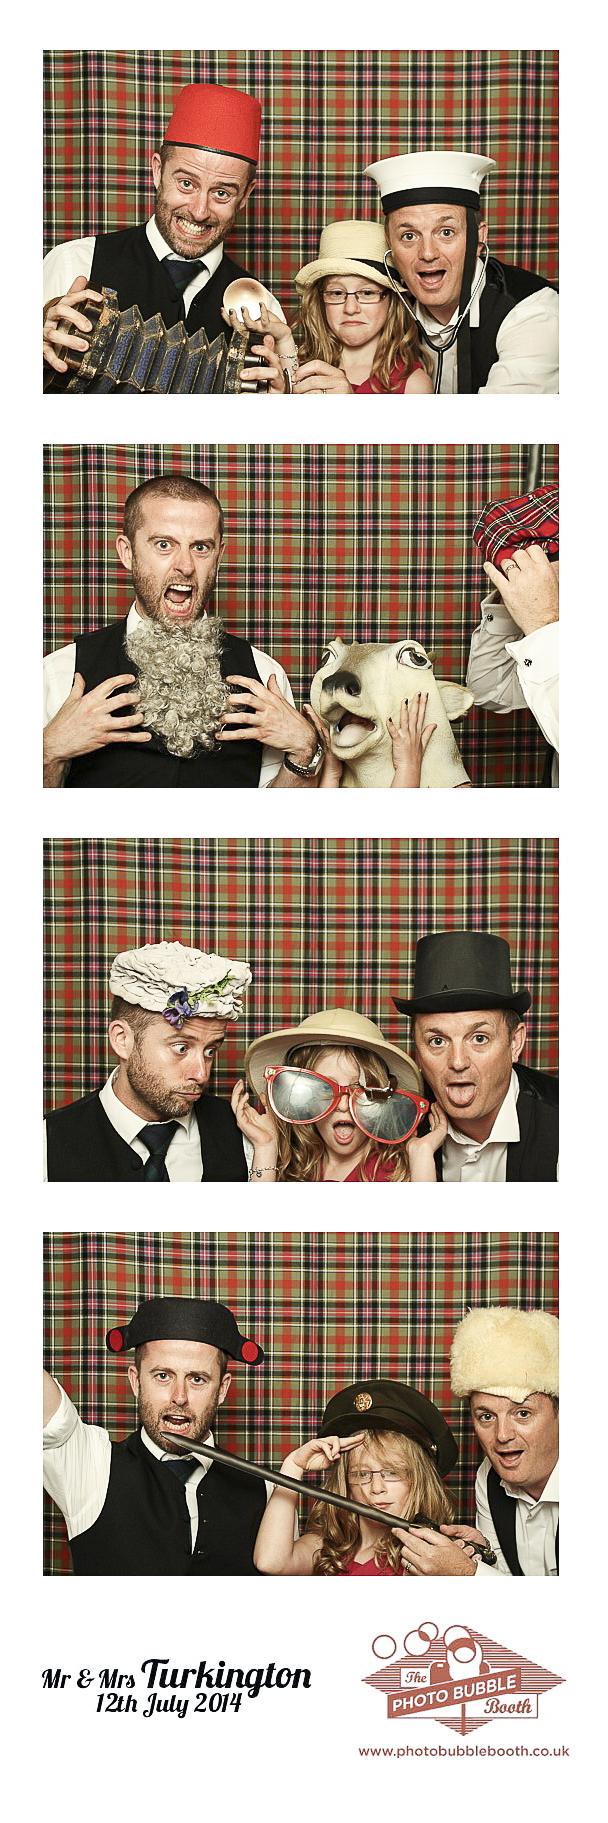 Mr & Mrs Turkington Photobooth _7.JPG